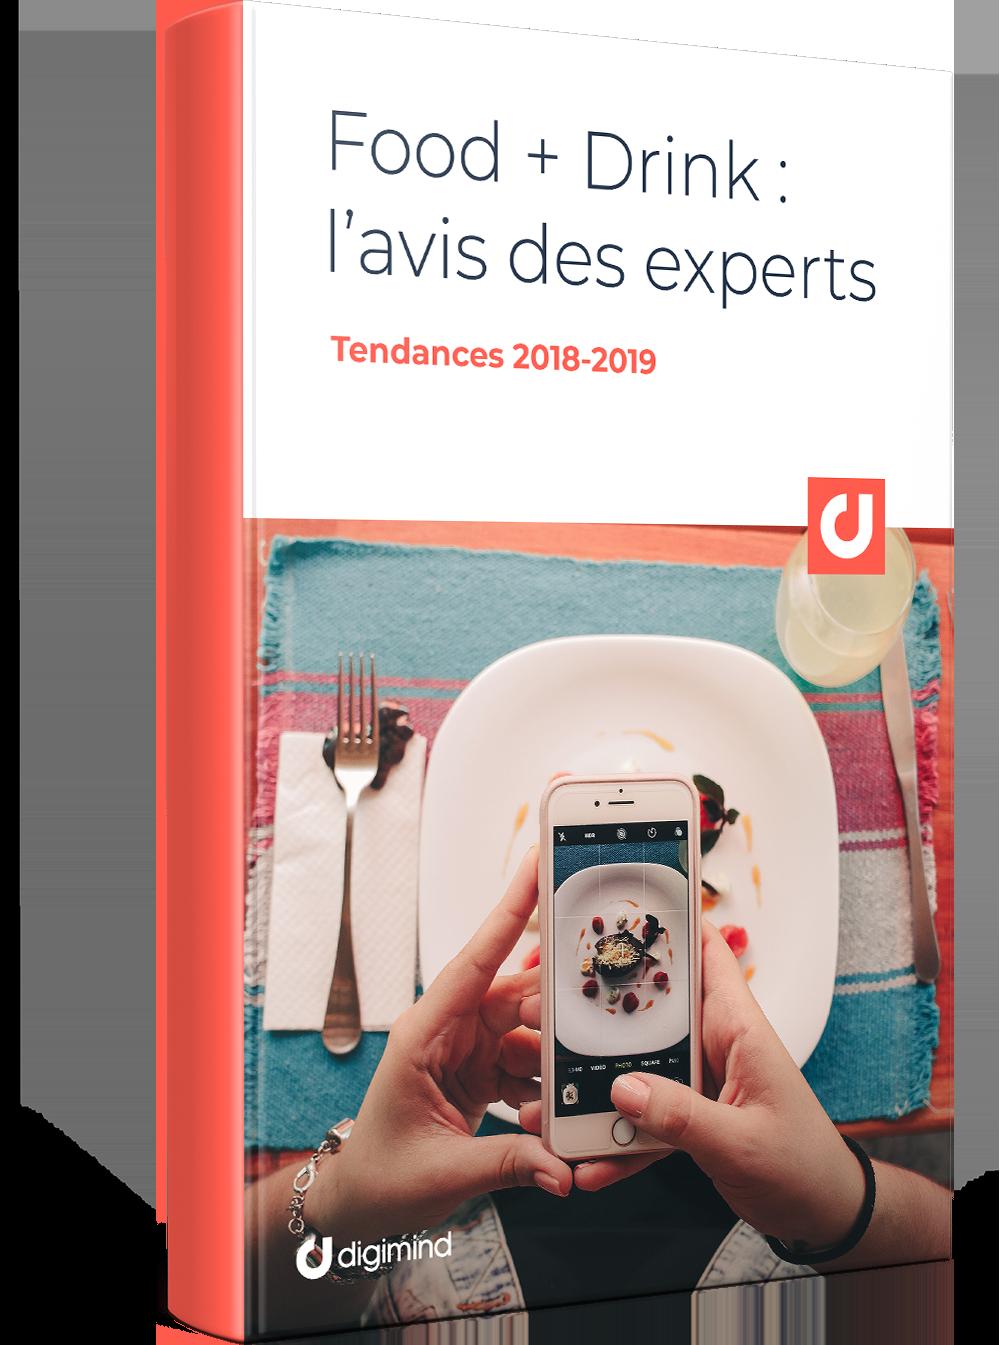 FR - Food Drink - l'avis des experts Tendances 2018-2019_3D BOOK